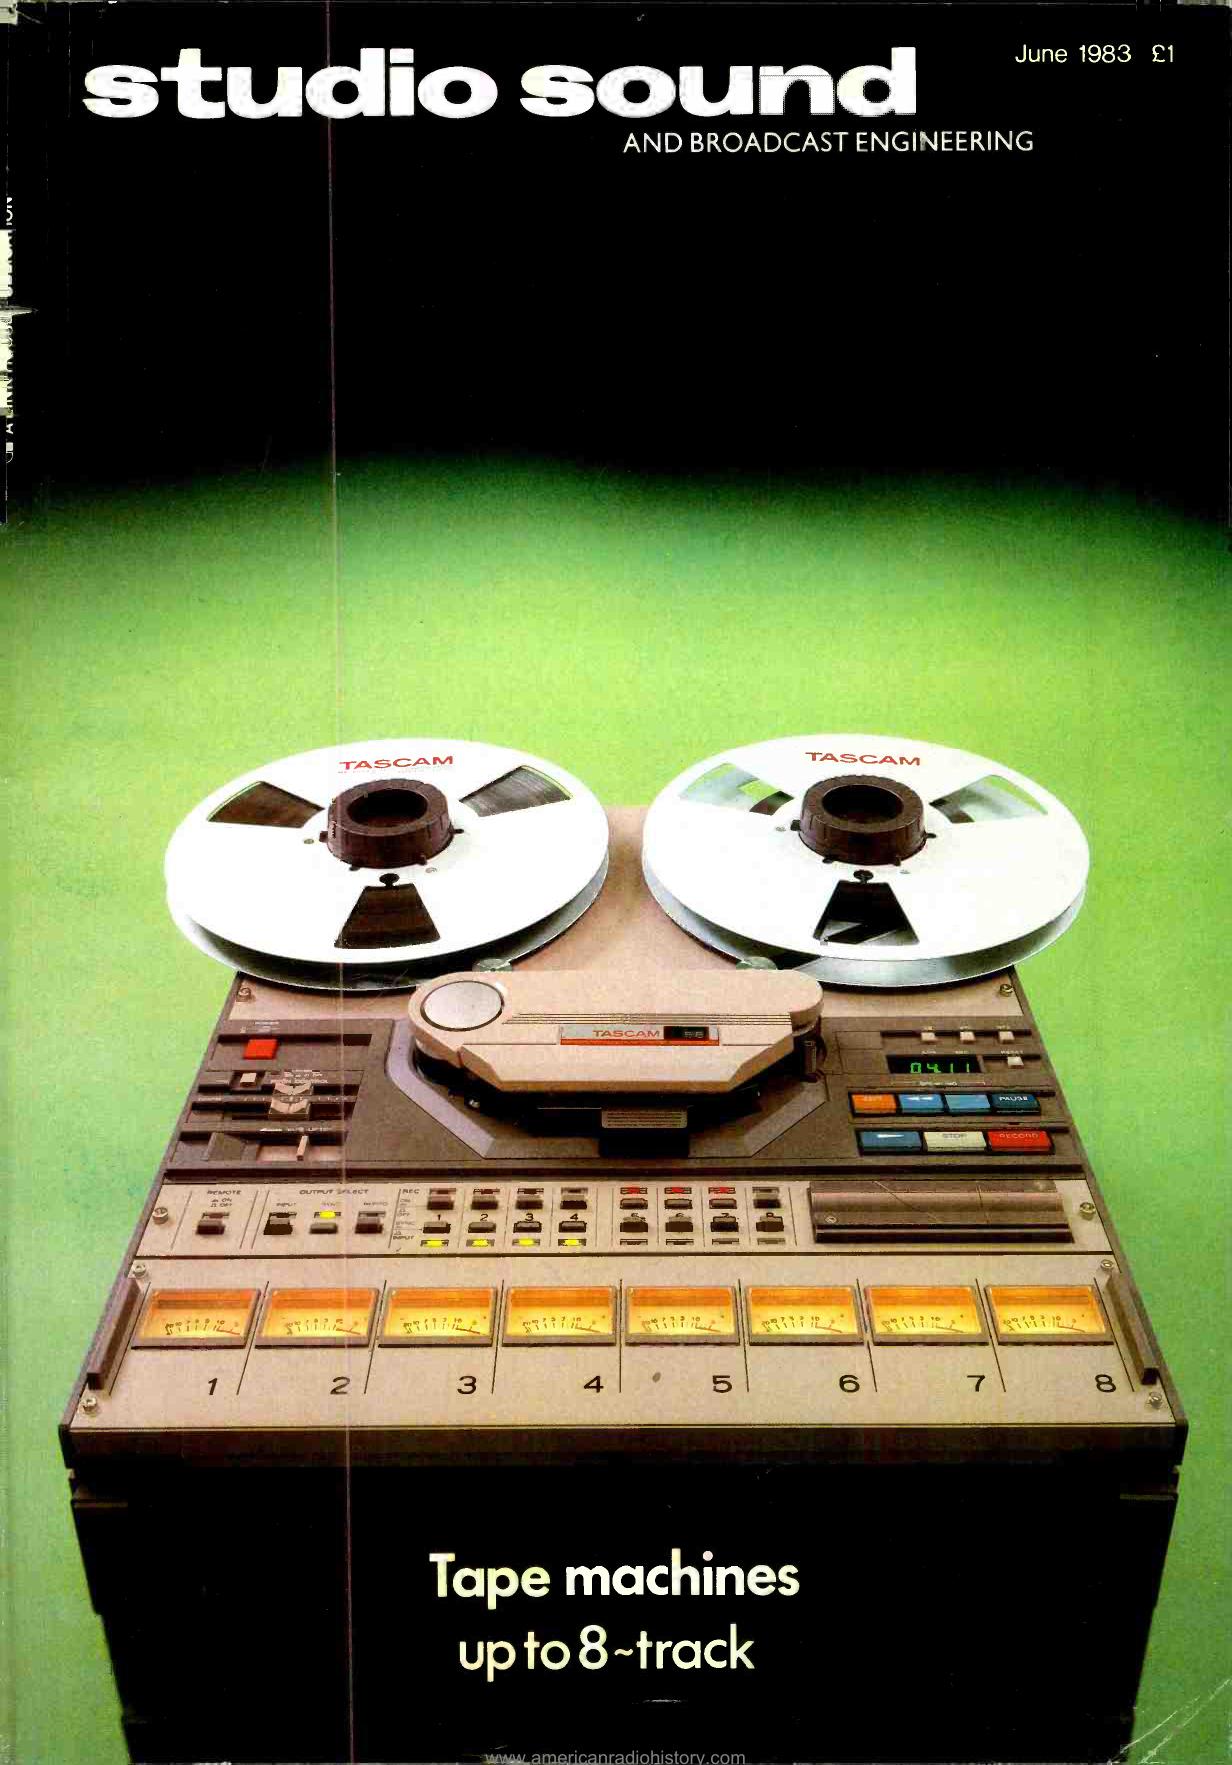 Heim-audio & Hifi Tv, Video & Audio Teac Lp-500 Cd-rekorder Mit Plasttenspieler /cassetten-player